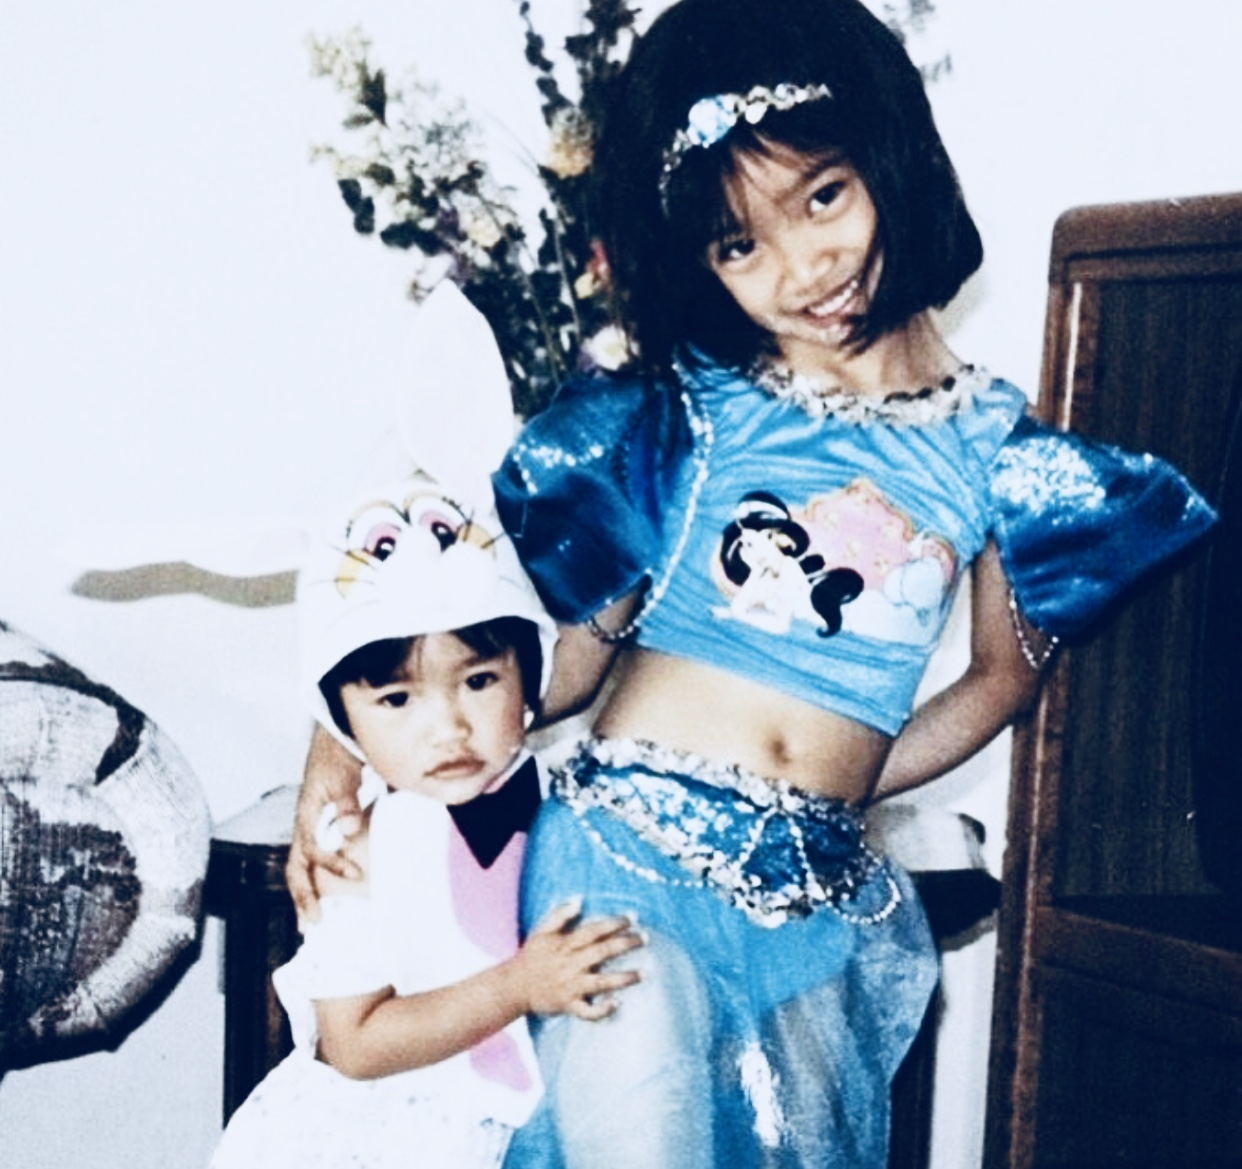 Nika + Bianca  circa 1995